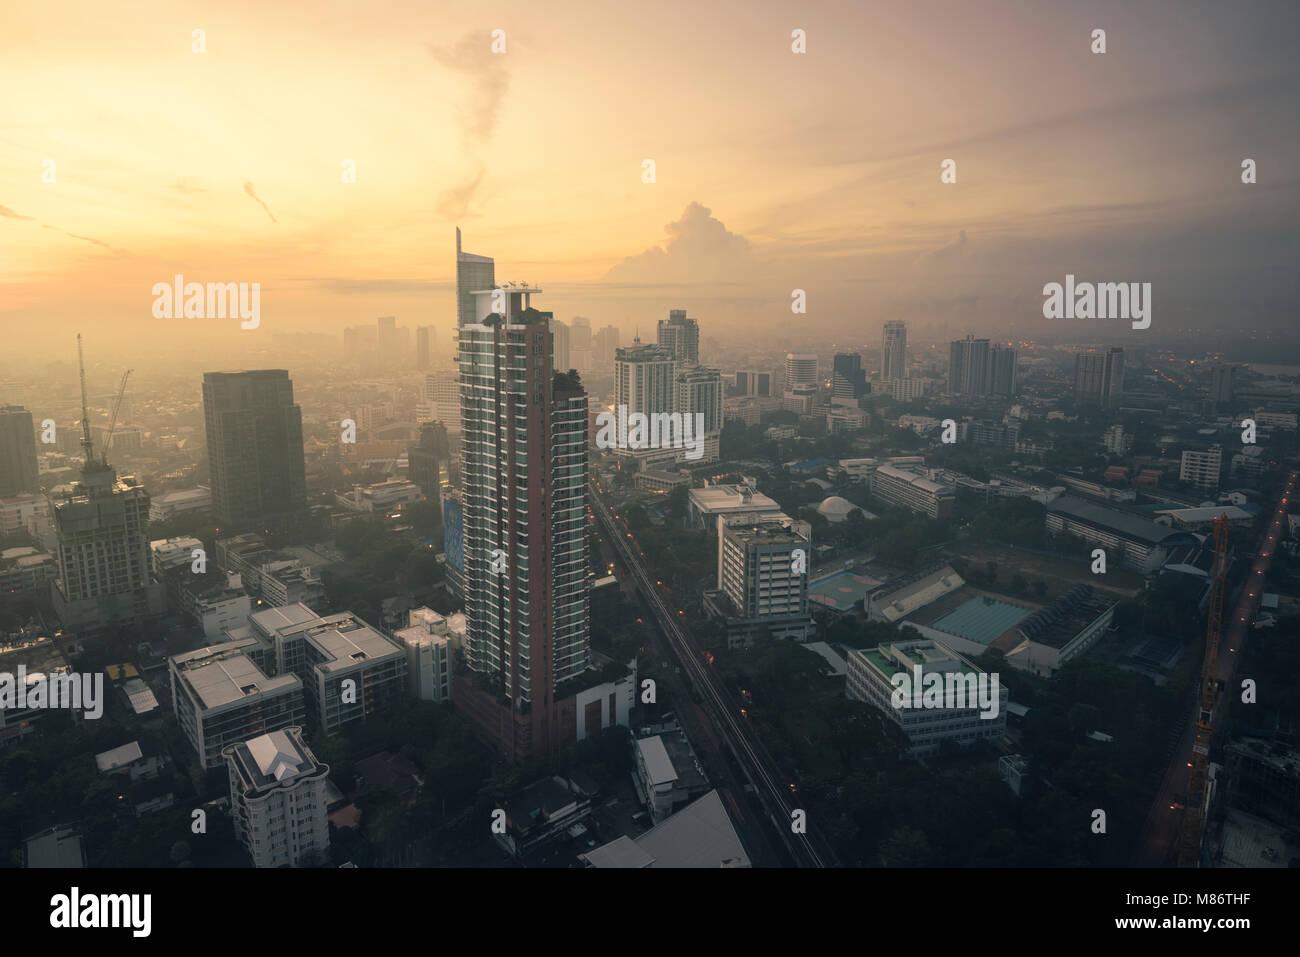 Skyline der Stadt bei Sonnenaufgang, Bangkok, Thailand Stockbild